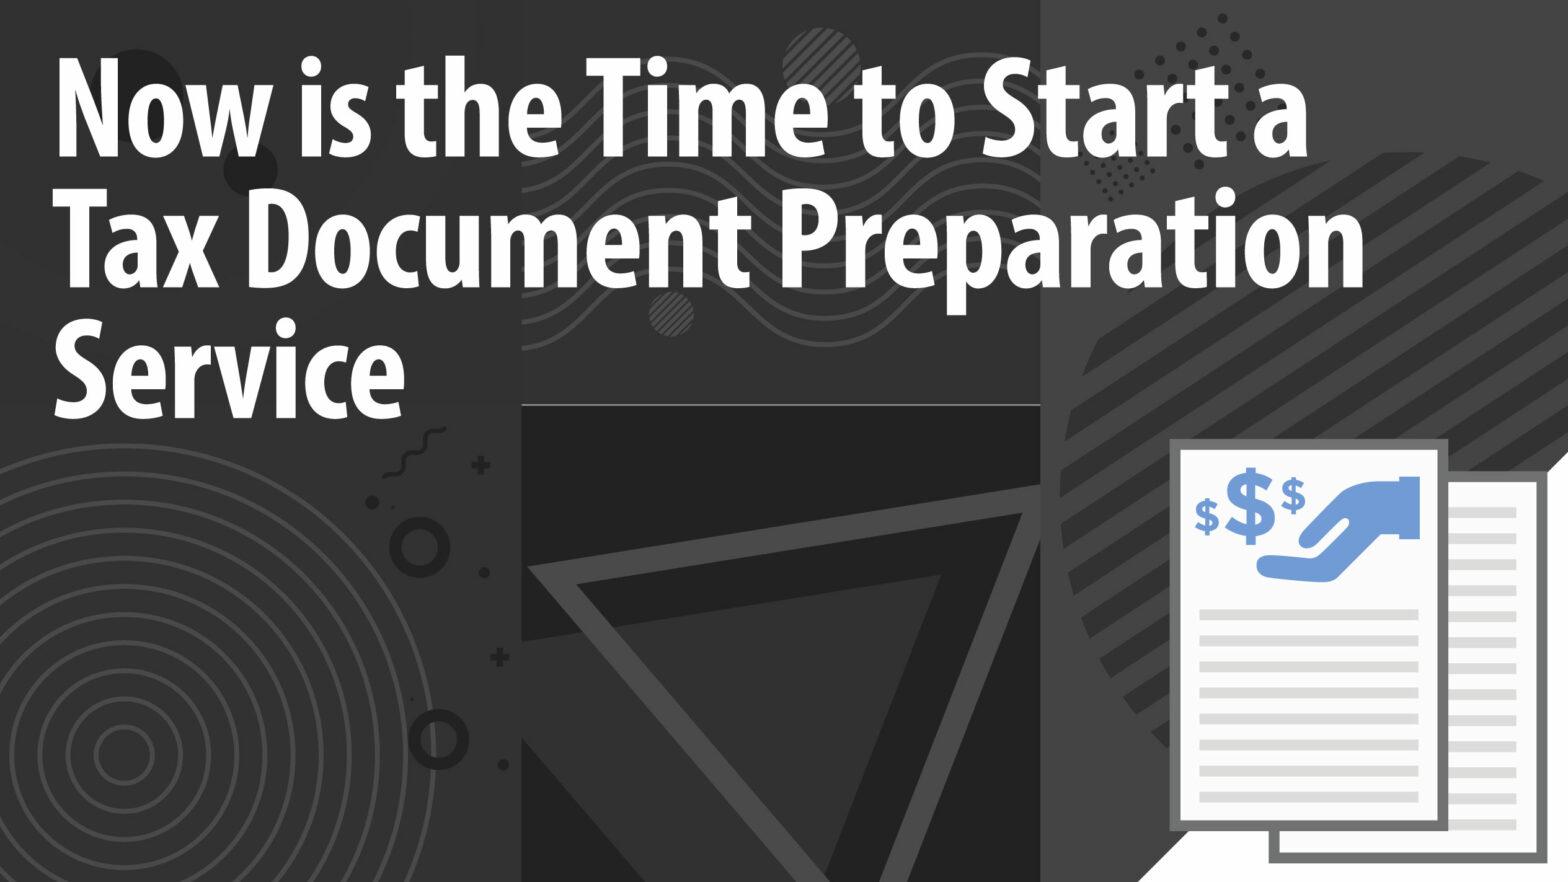 Tax Document Preparation Article Header